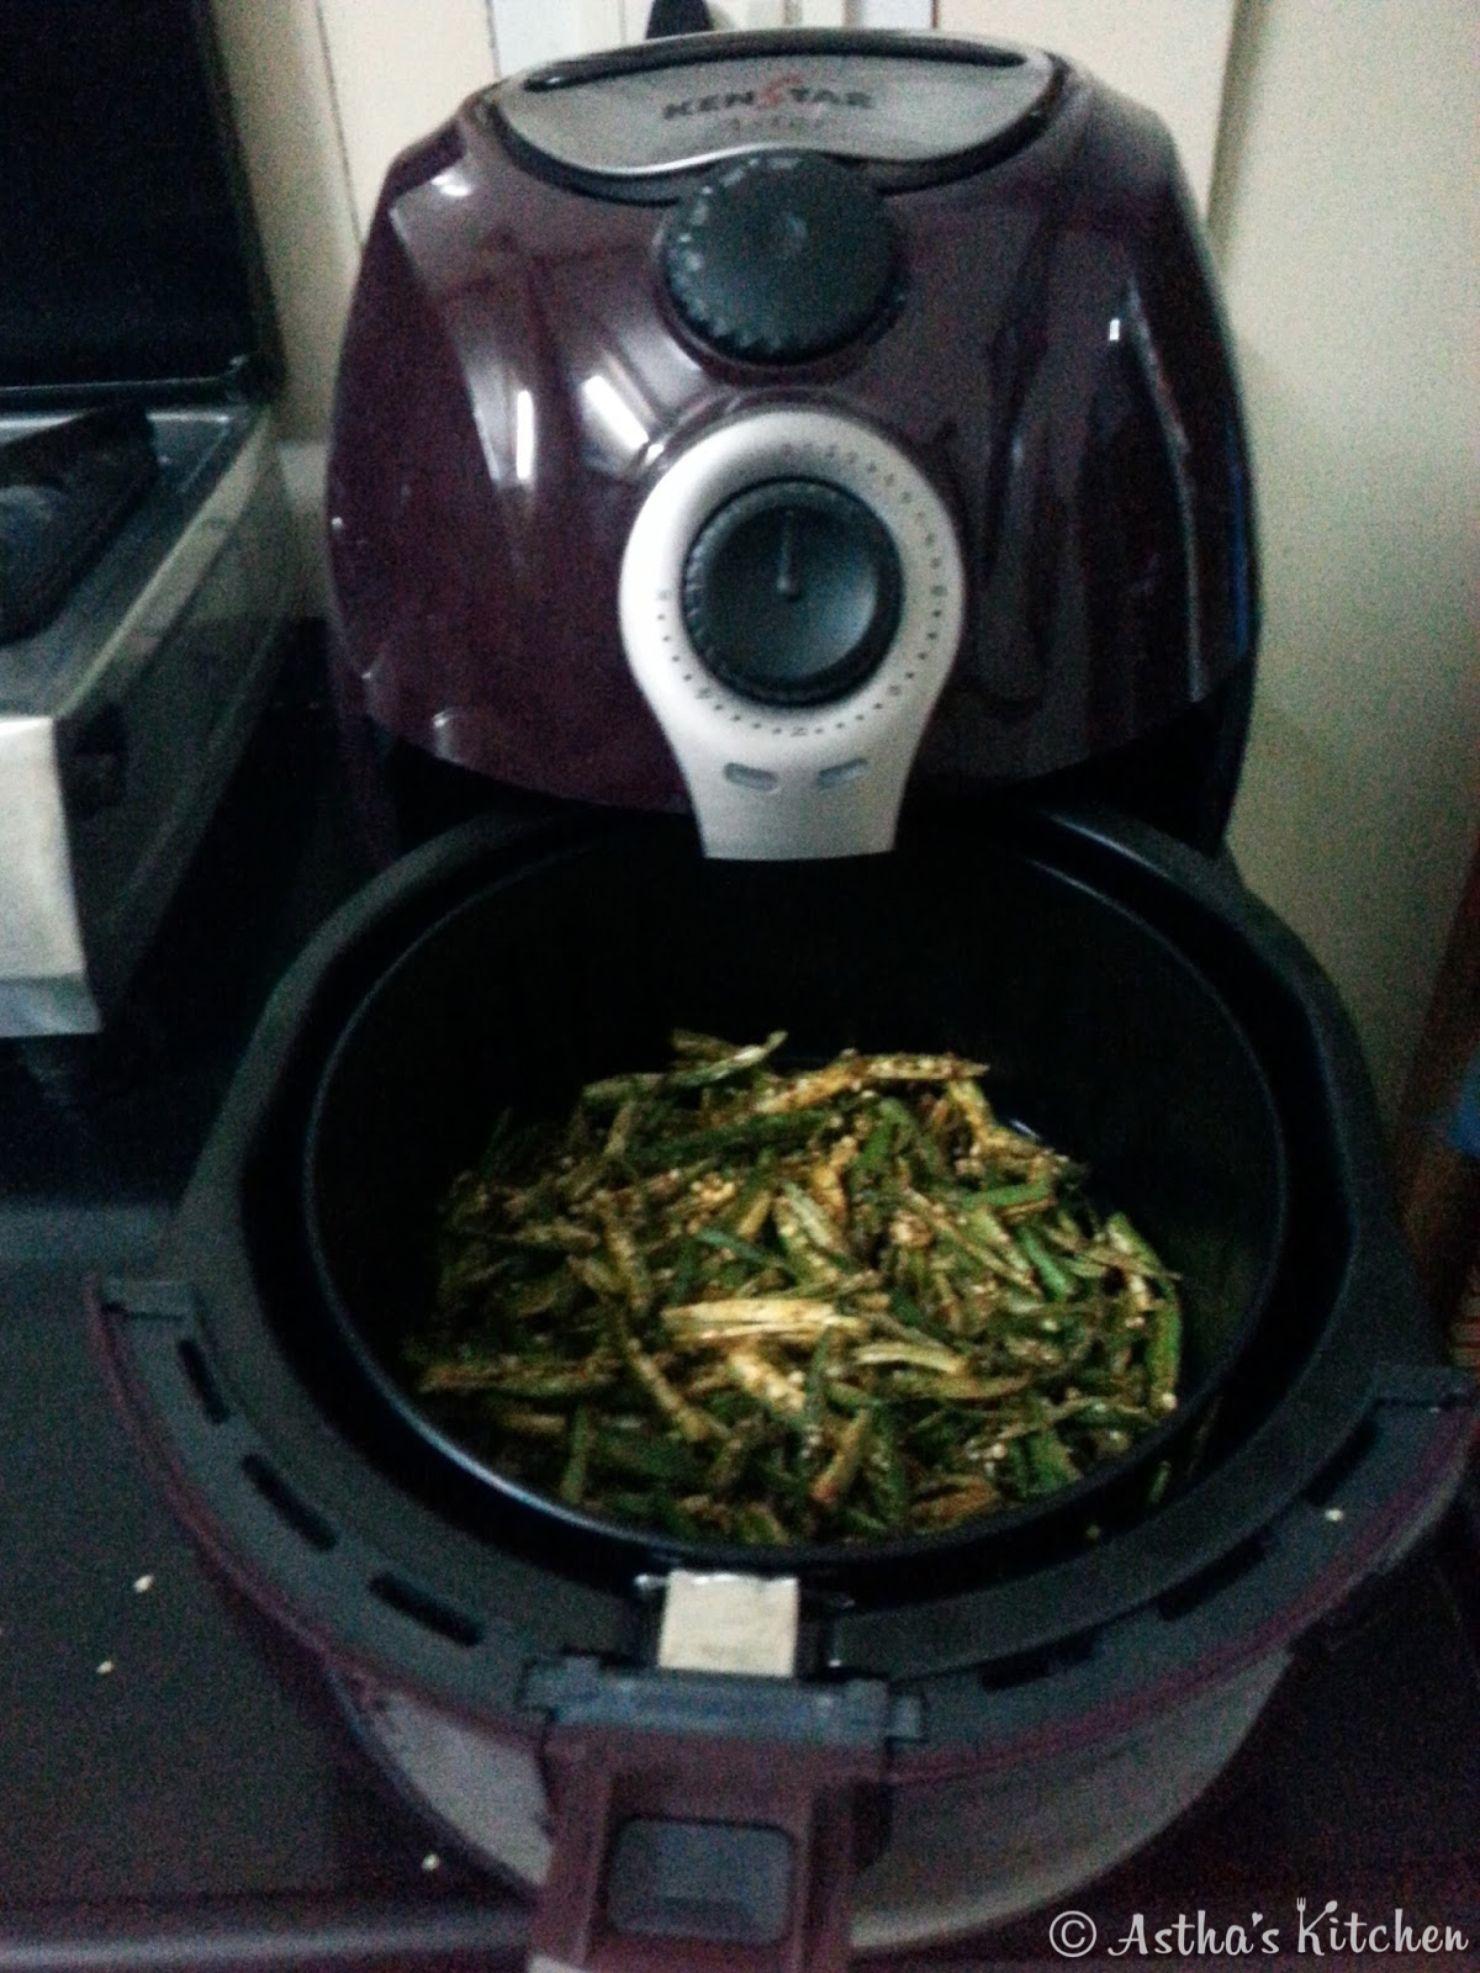 Kurkuri Bhindi (Okra) in Air Fryer Air fryer recipes